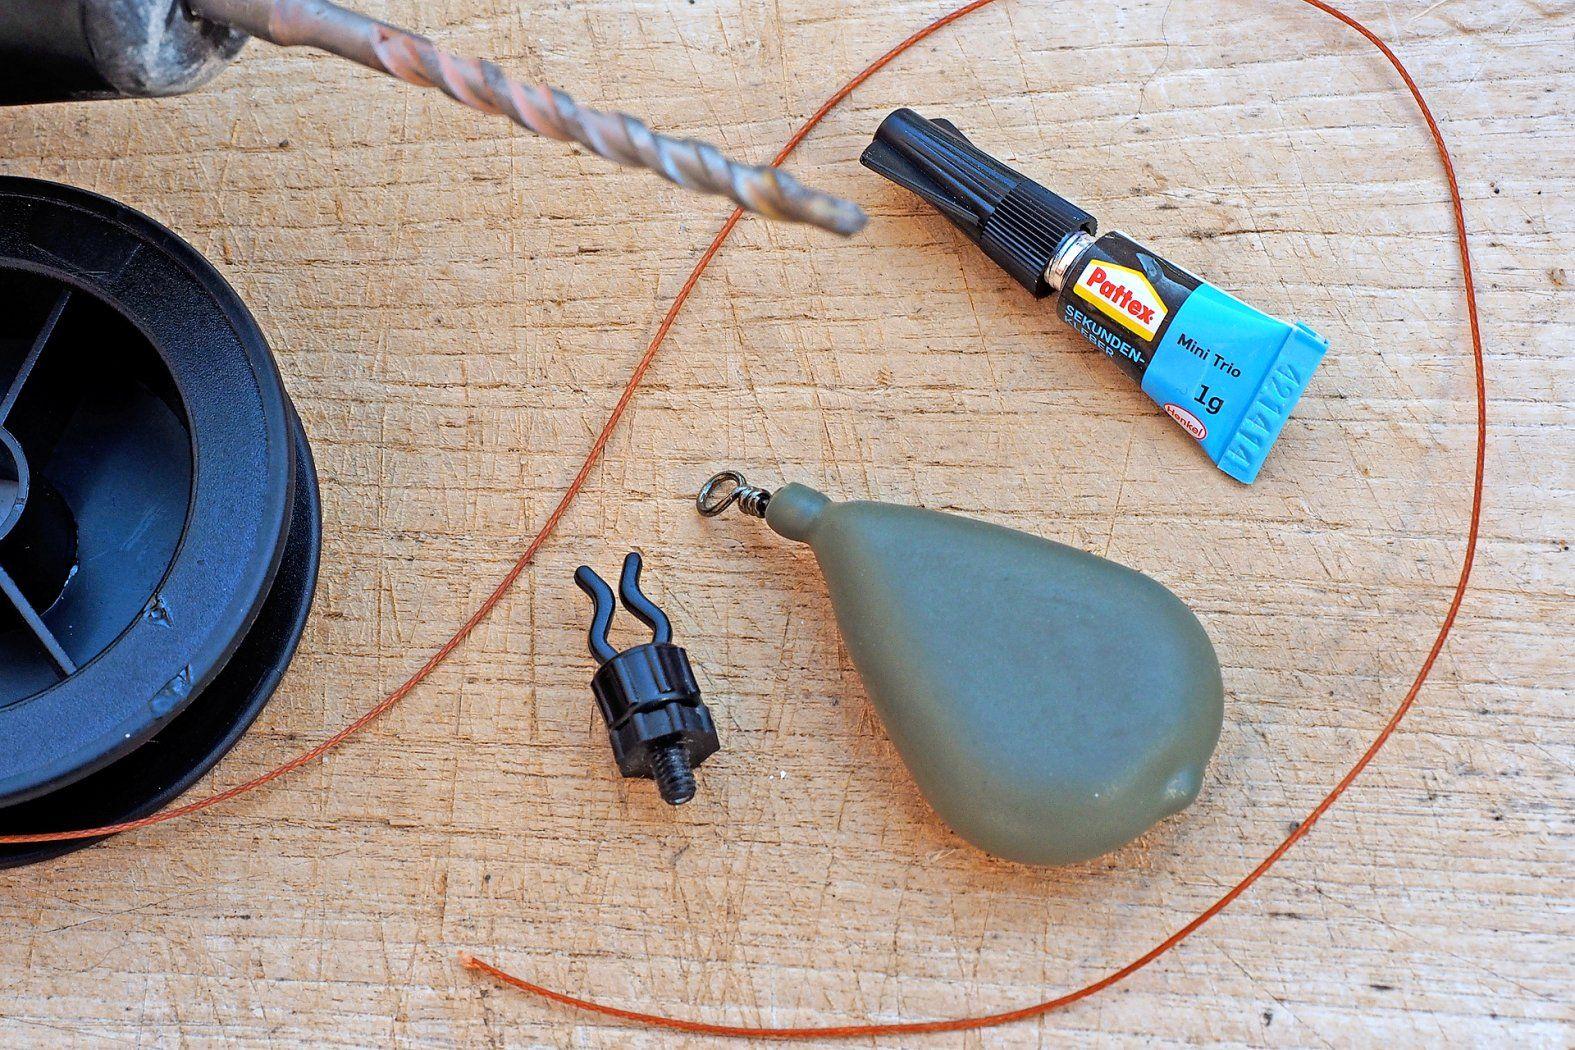 leinen runter karpfenangeln carp fishing carp. Black Bedroom Furniture Sets. Home Design Ideas